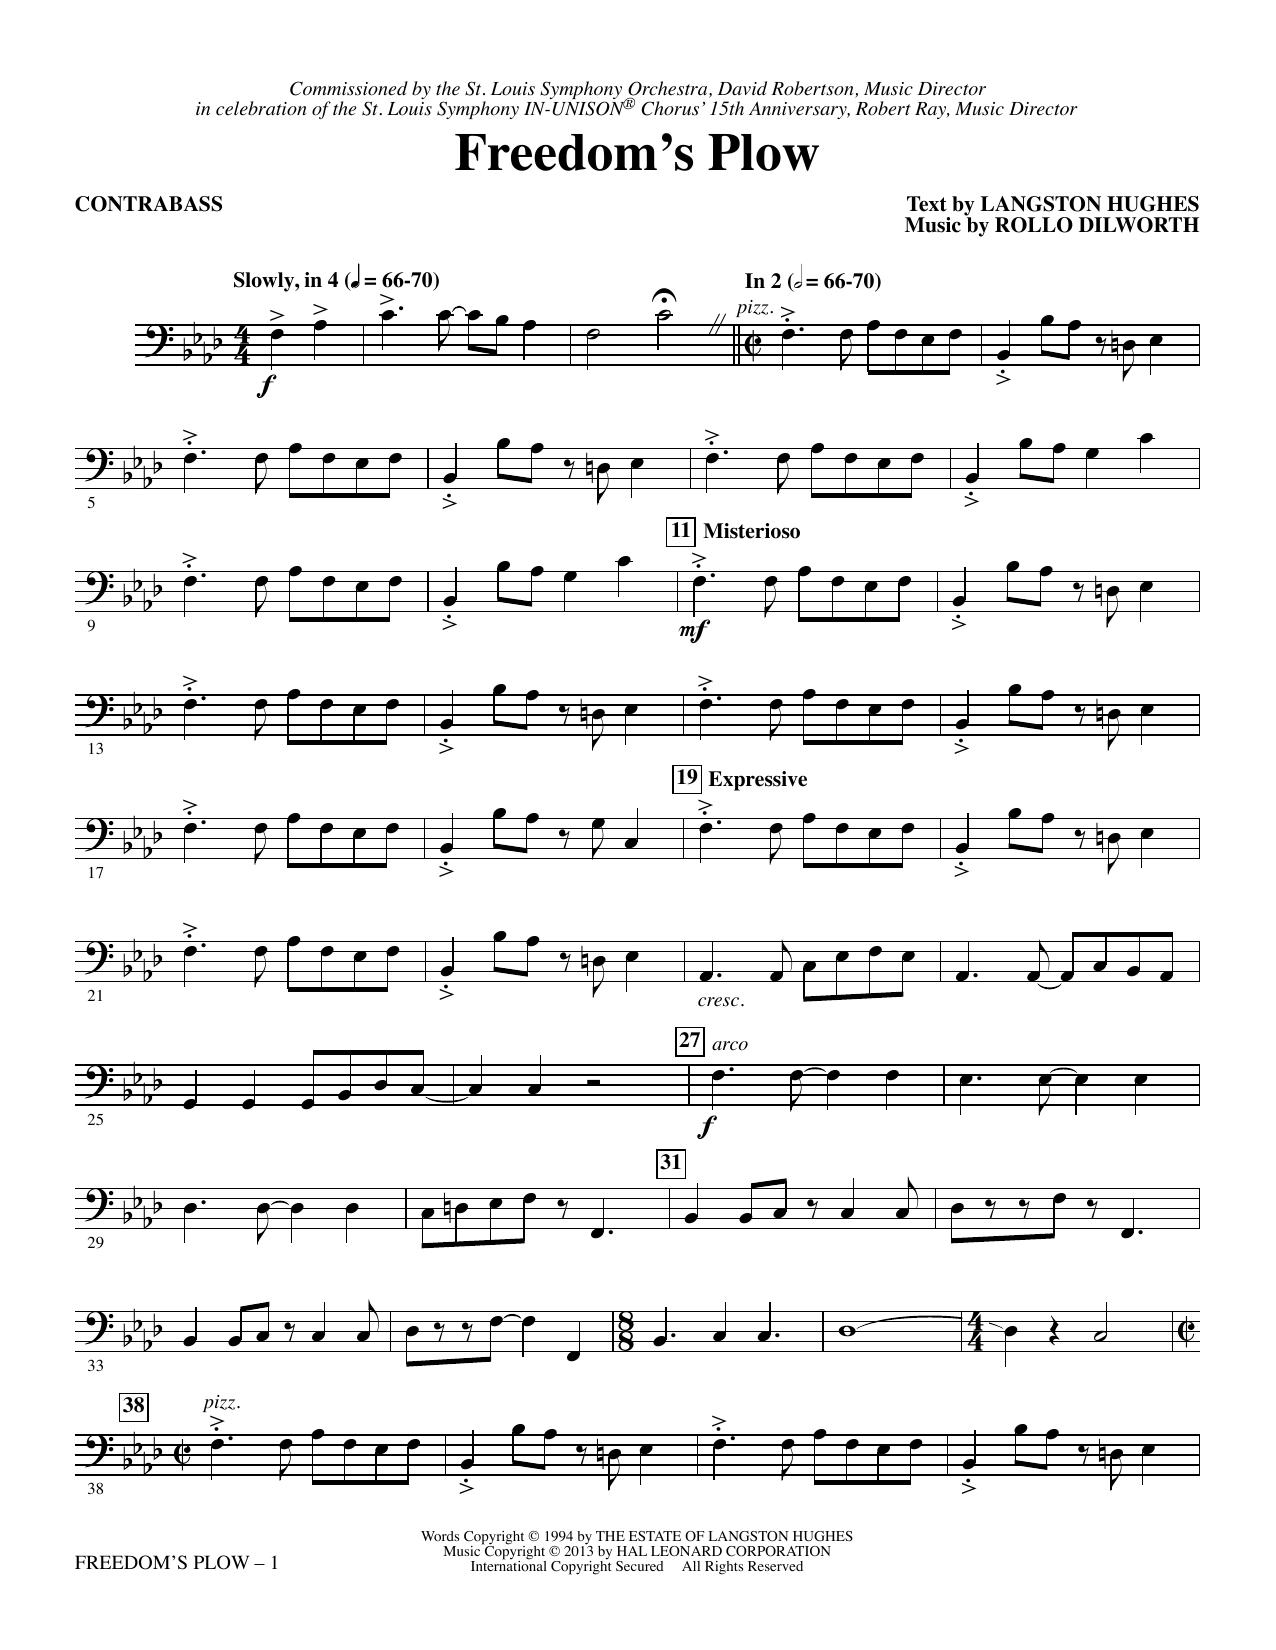 Freedom's Plow - Contrabass sheet music